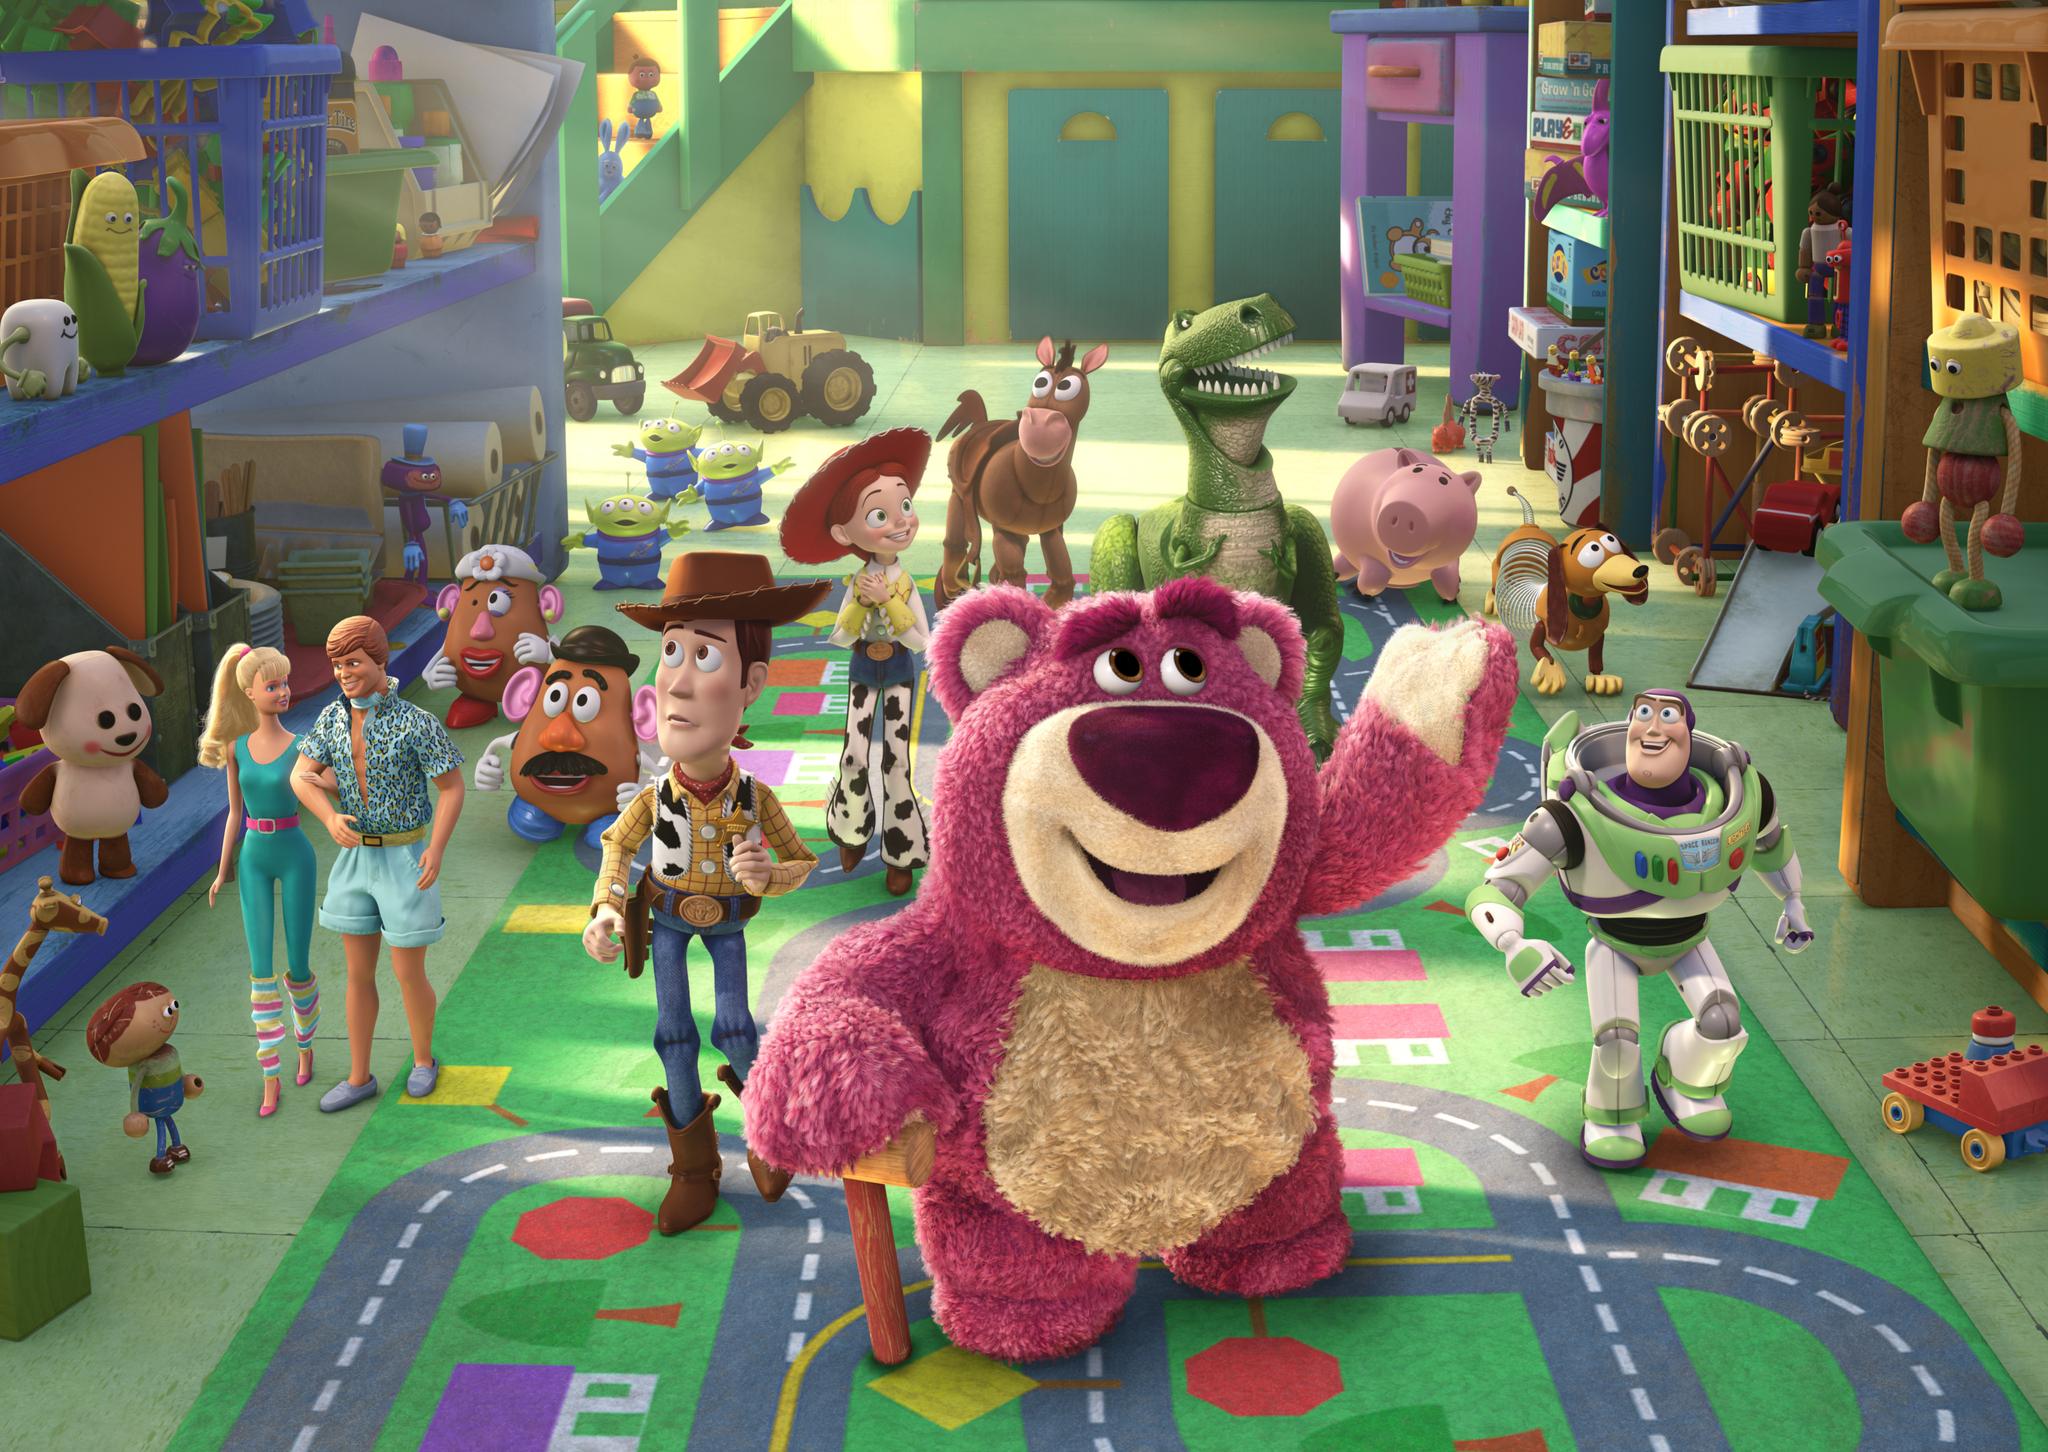 Toy Story 3 | Highest Grossing Film 2010 | Popcorn Banter